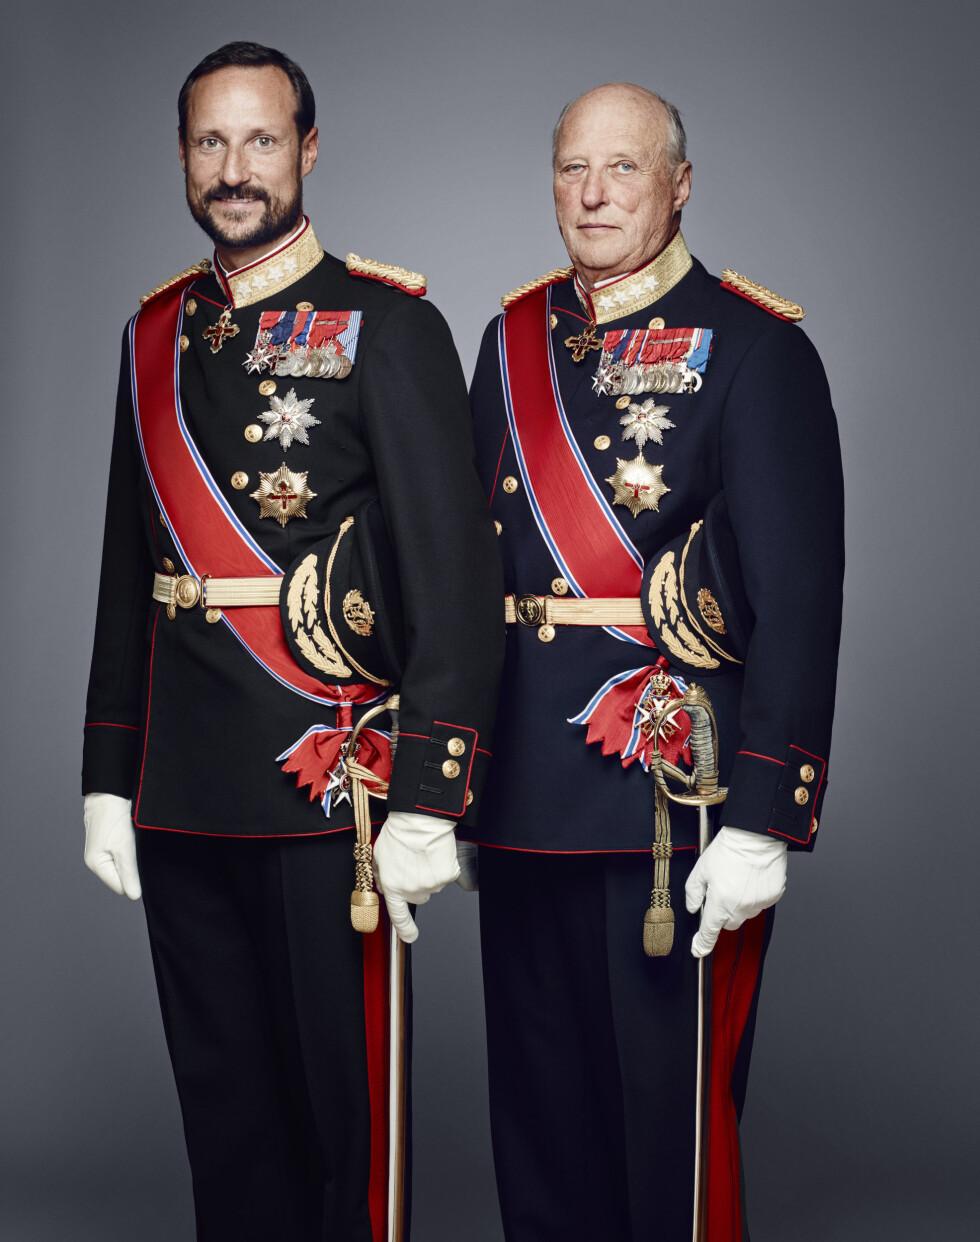 25 ÅR: Kronprins Haakon og kong Harald. Foto: NTB scanpix